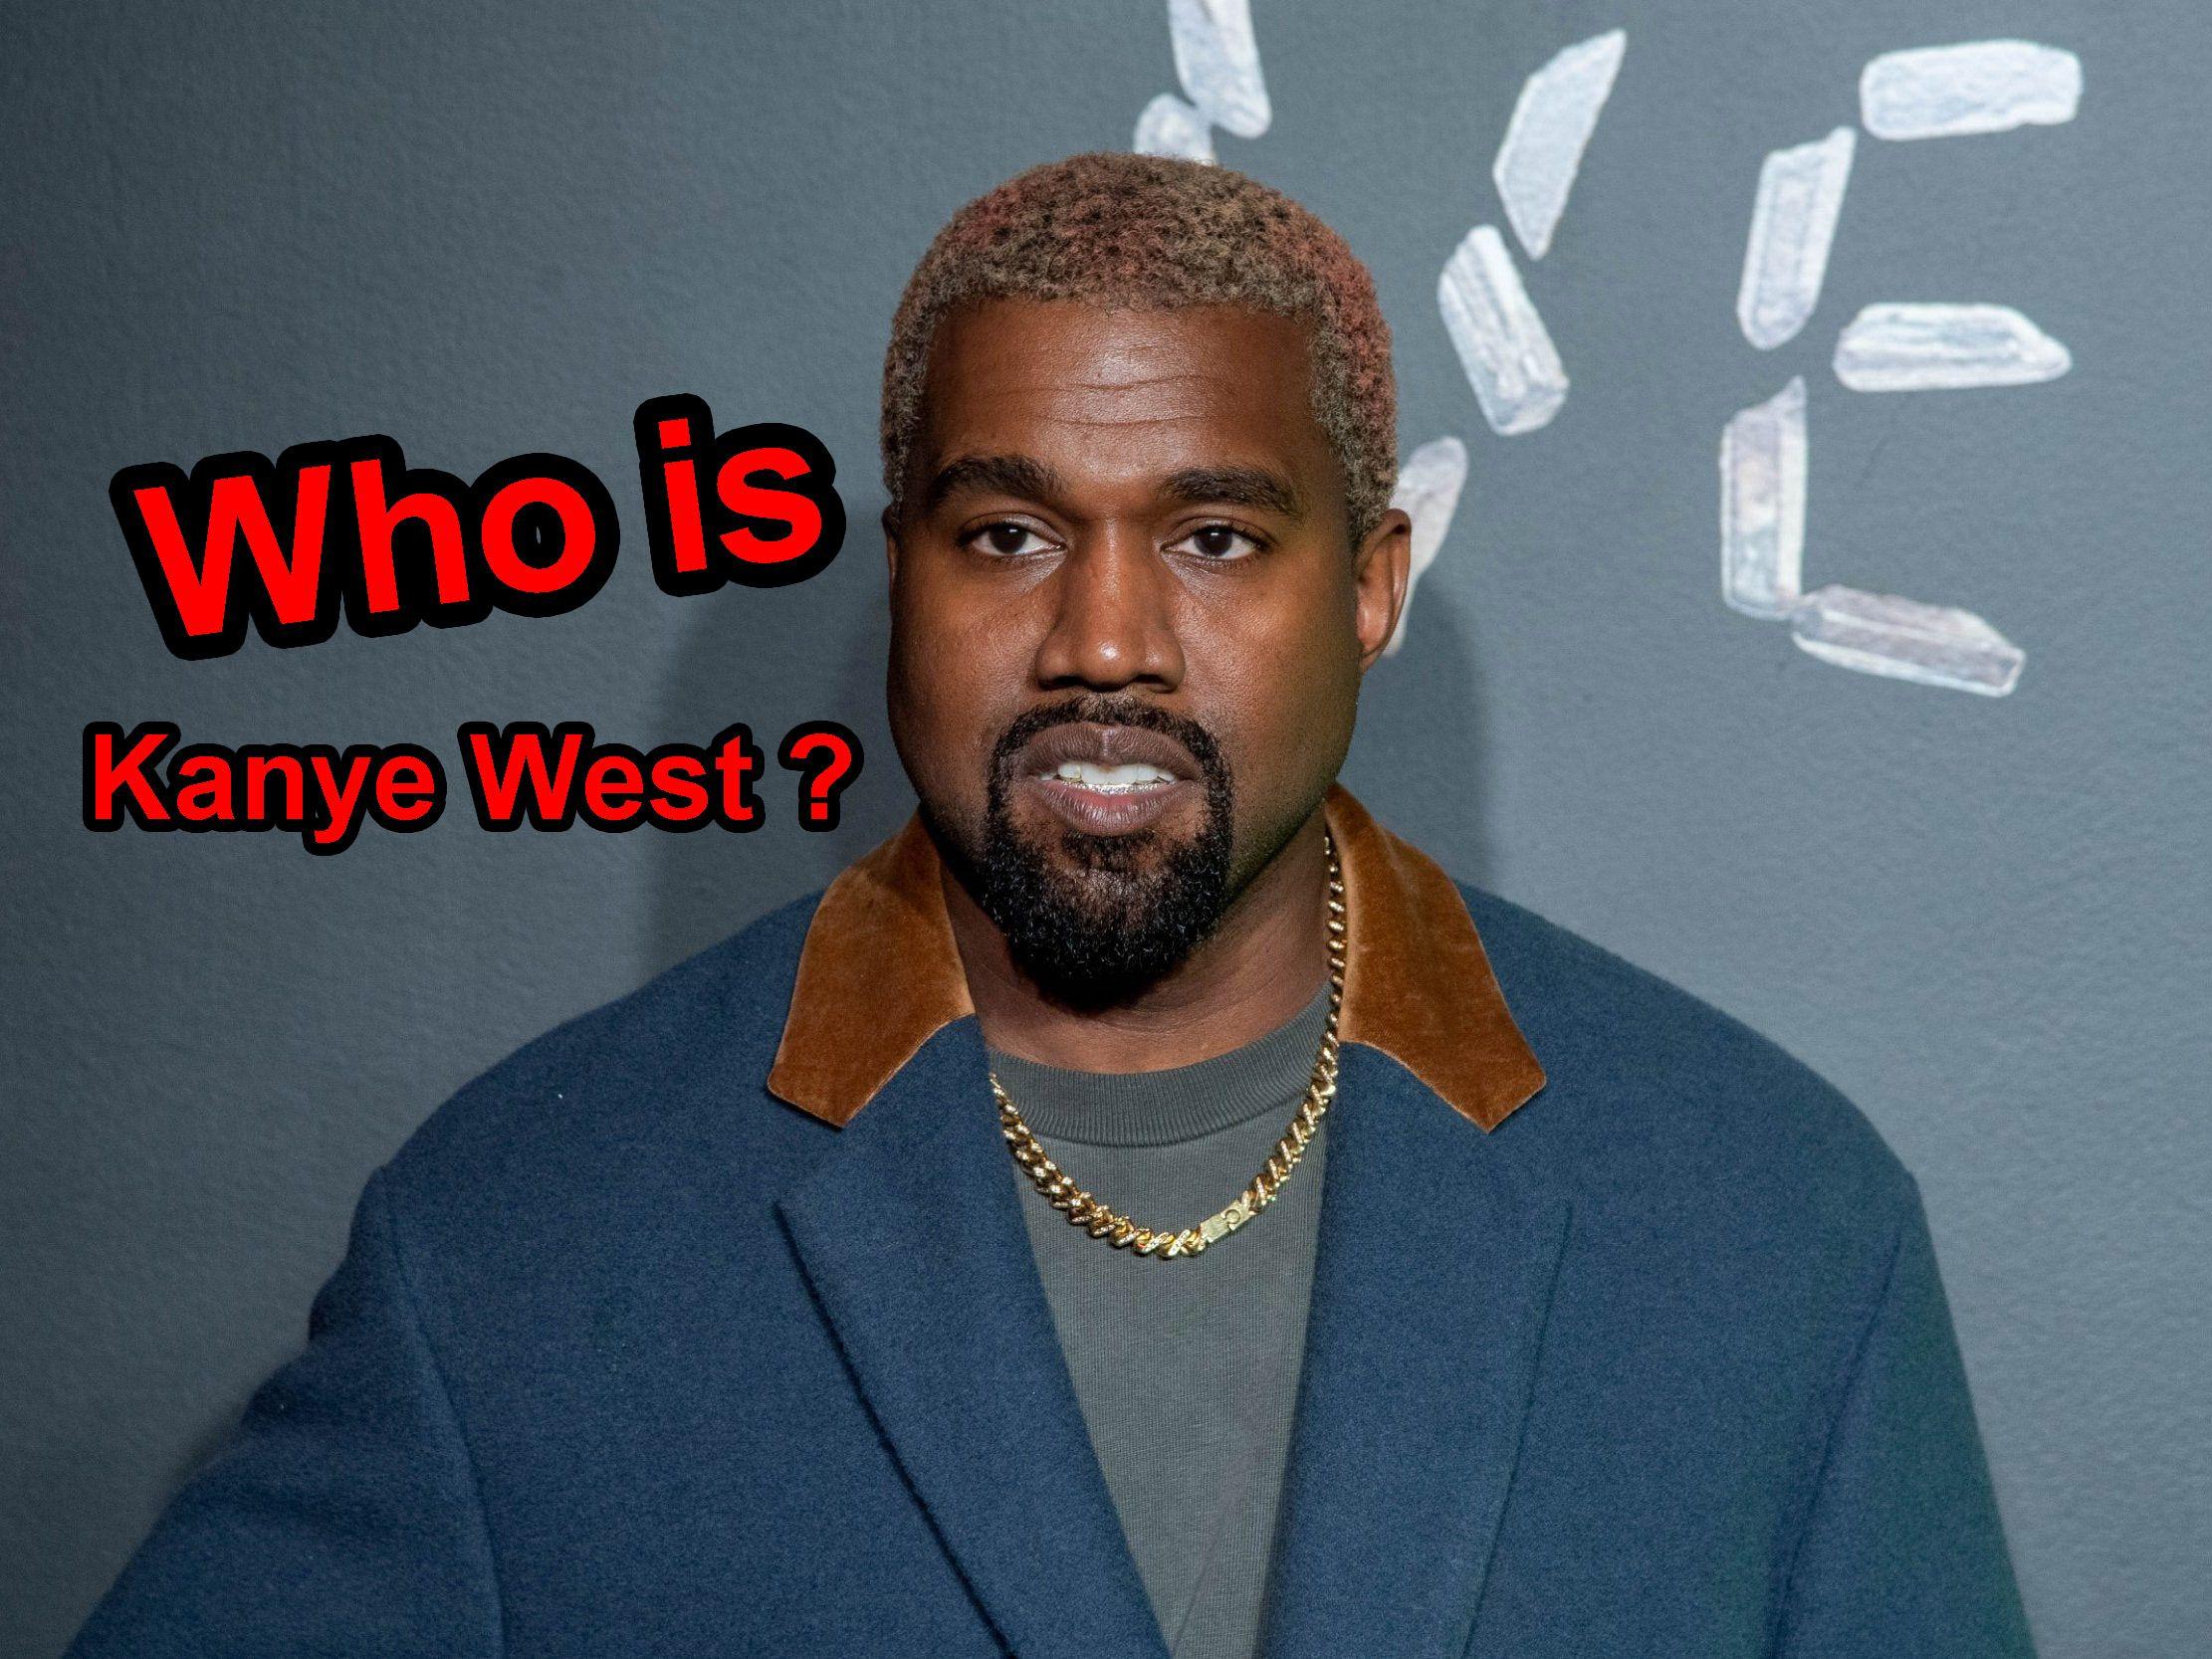 Us 2020 Presidential Race Kanye West Backs Down Gives Reason In 2020 Kanye West New Song Kanye West Kanye